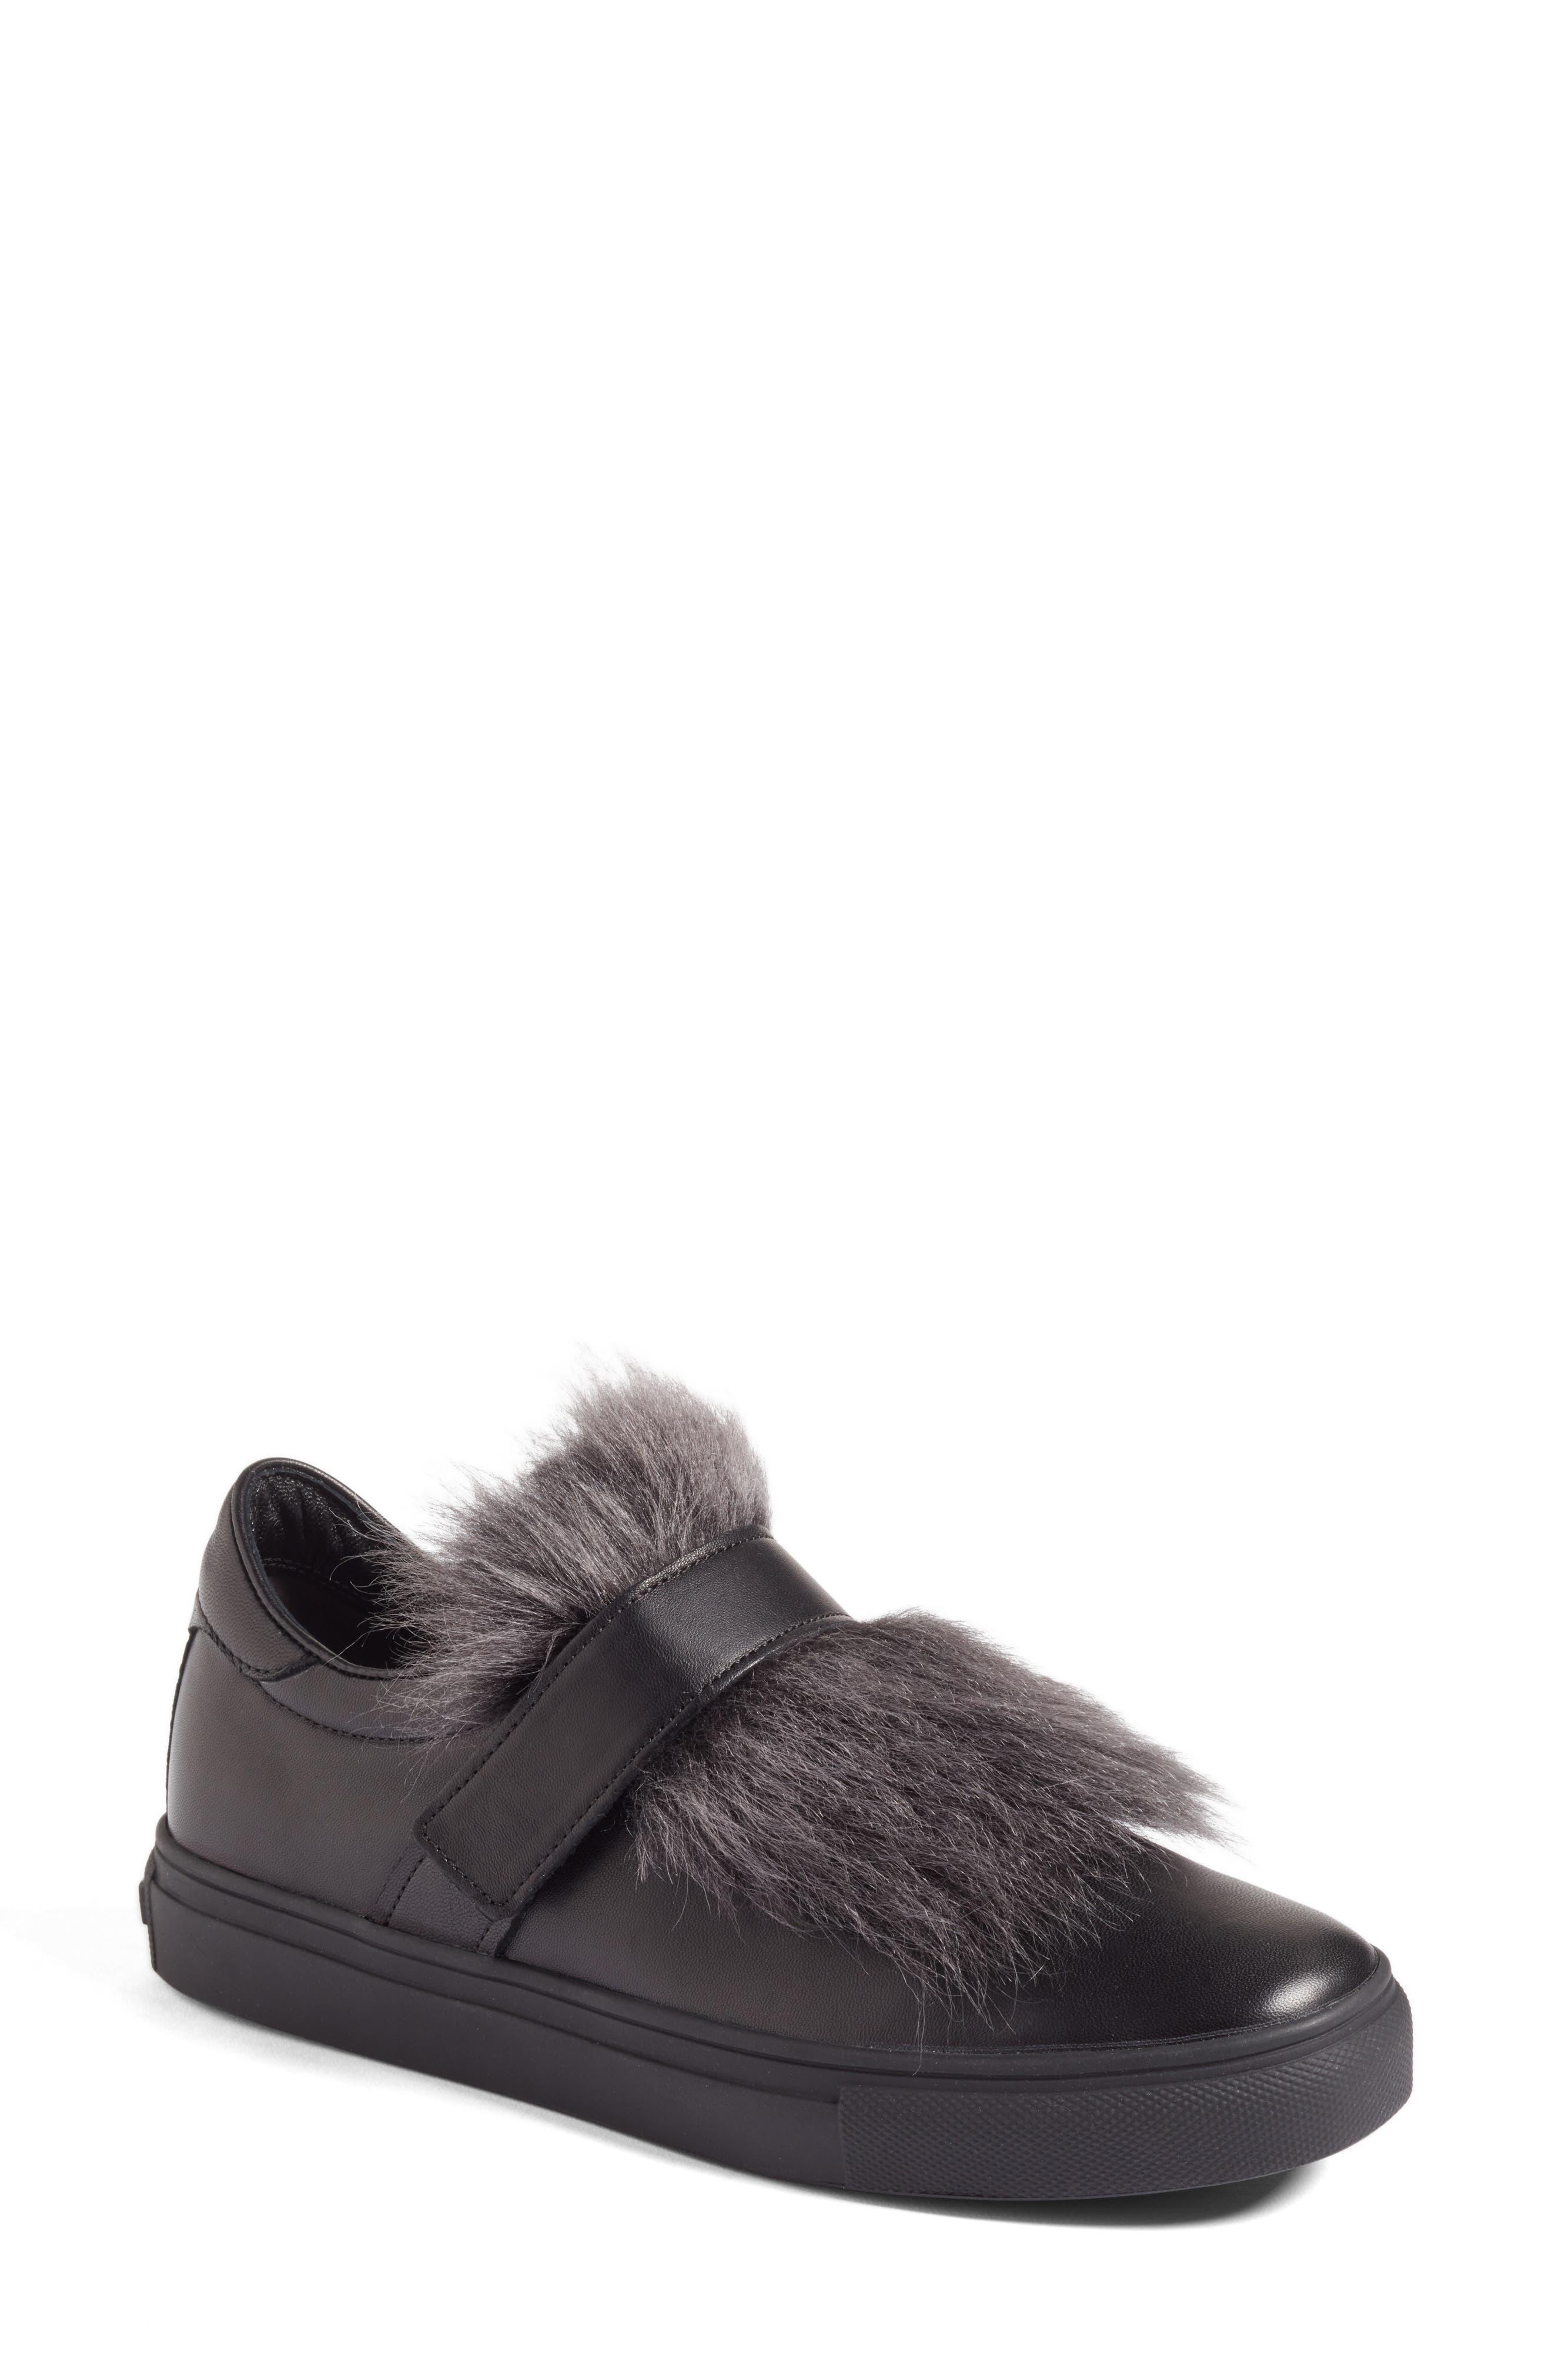 Kennel & Schmenger Basket Slip-On Sneaker with Genuine Shearling Trim,                         Main,                         color, 001